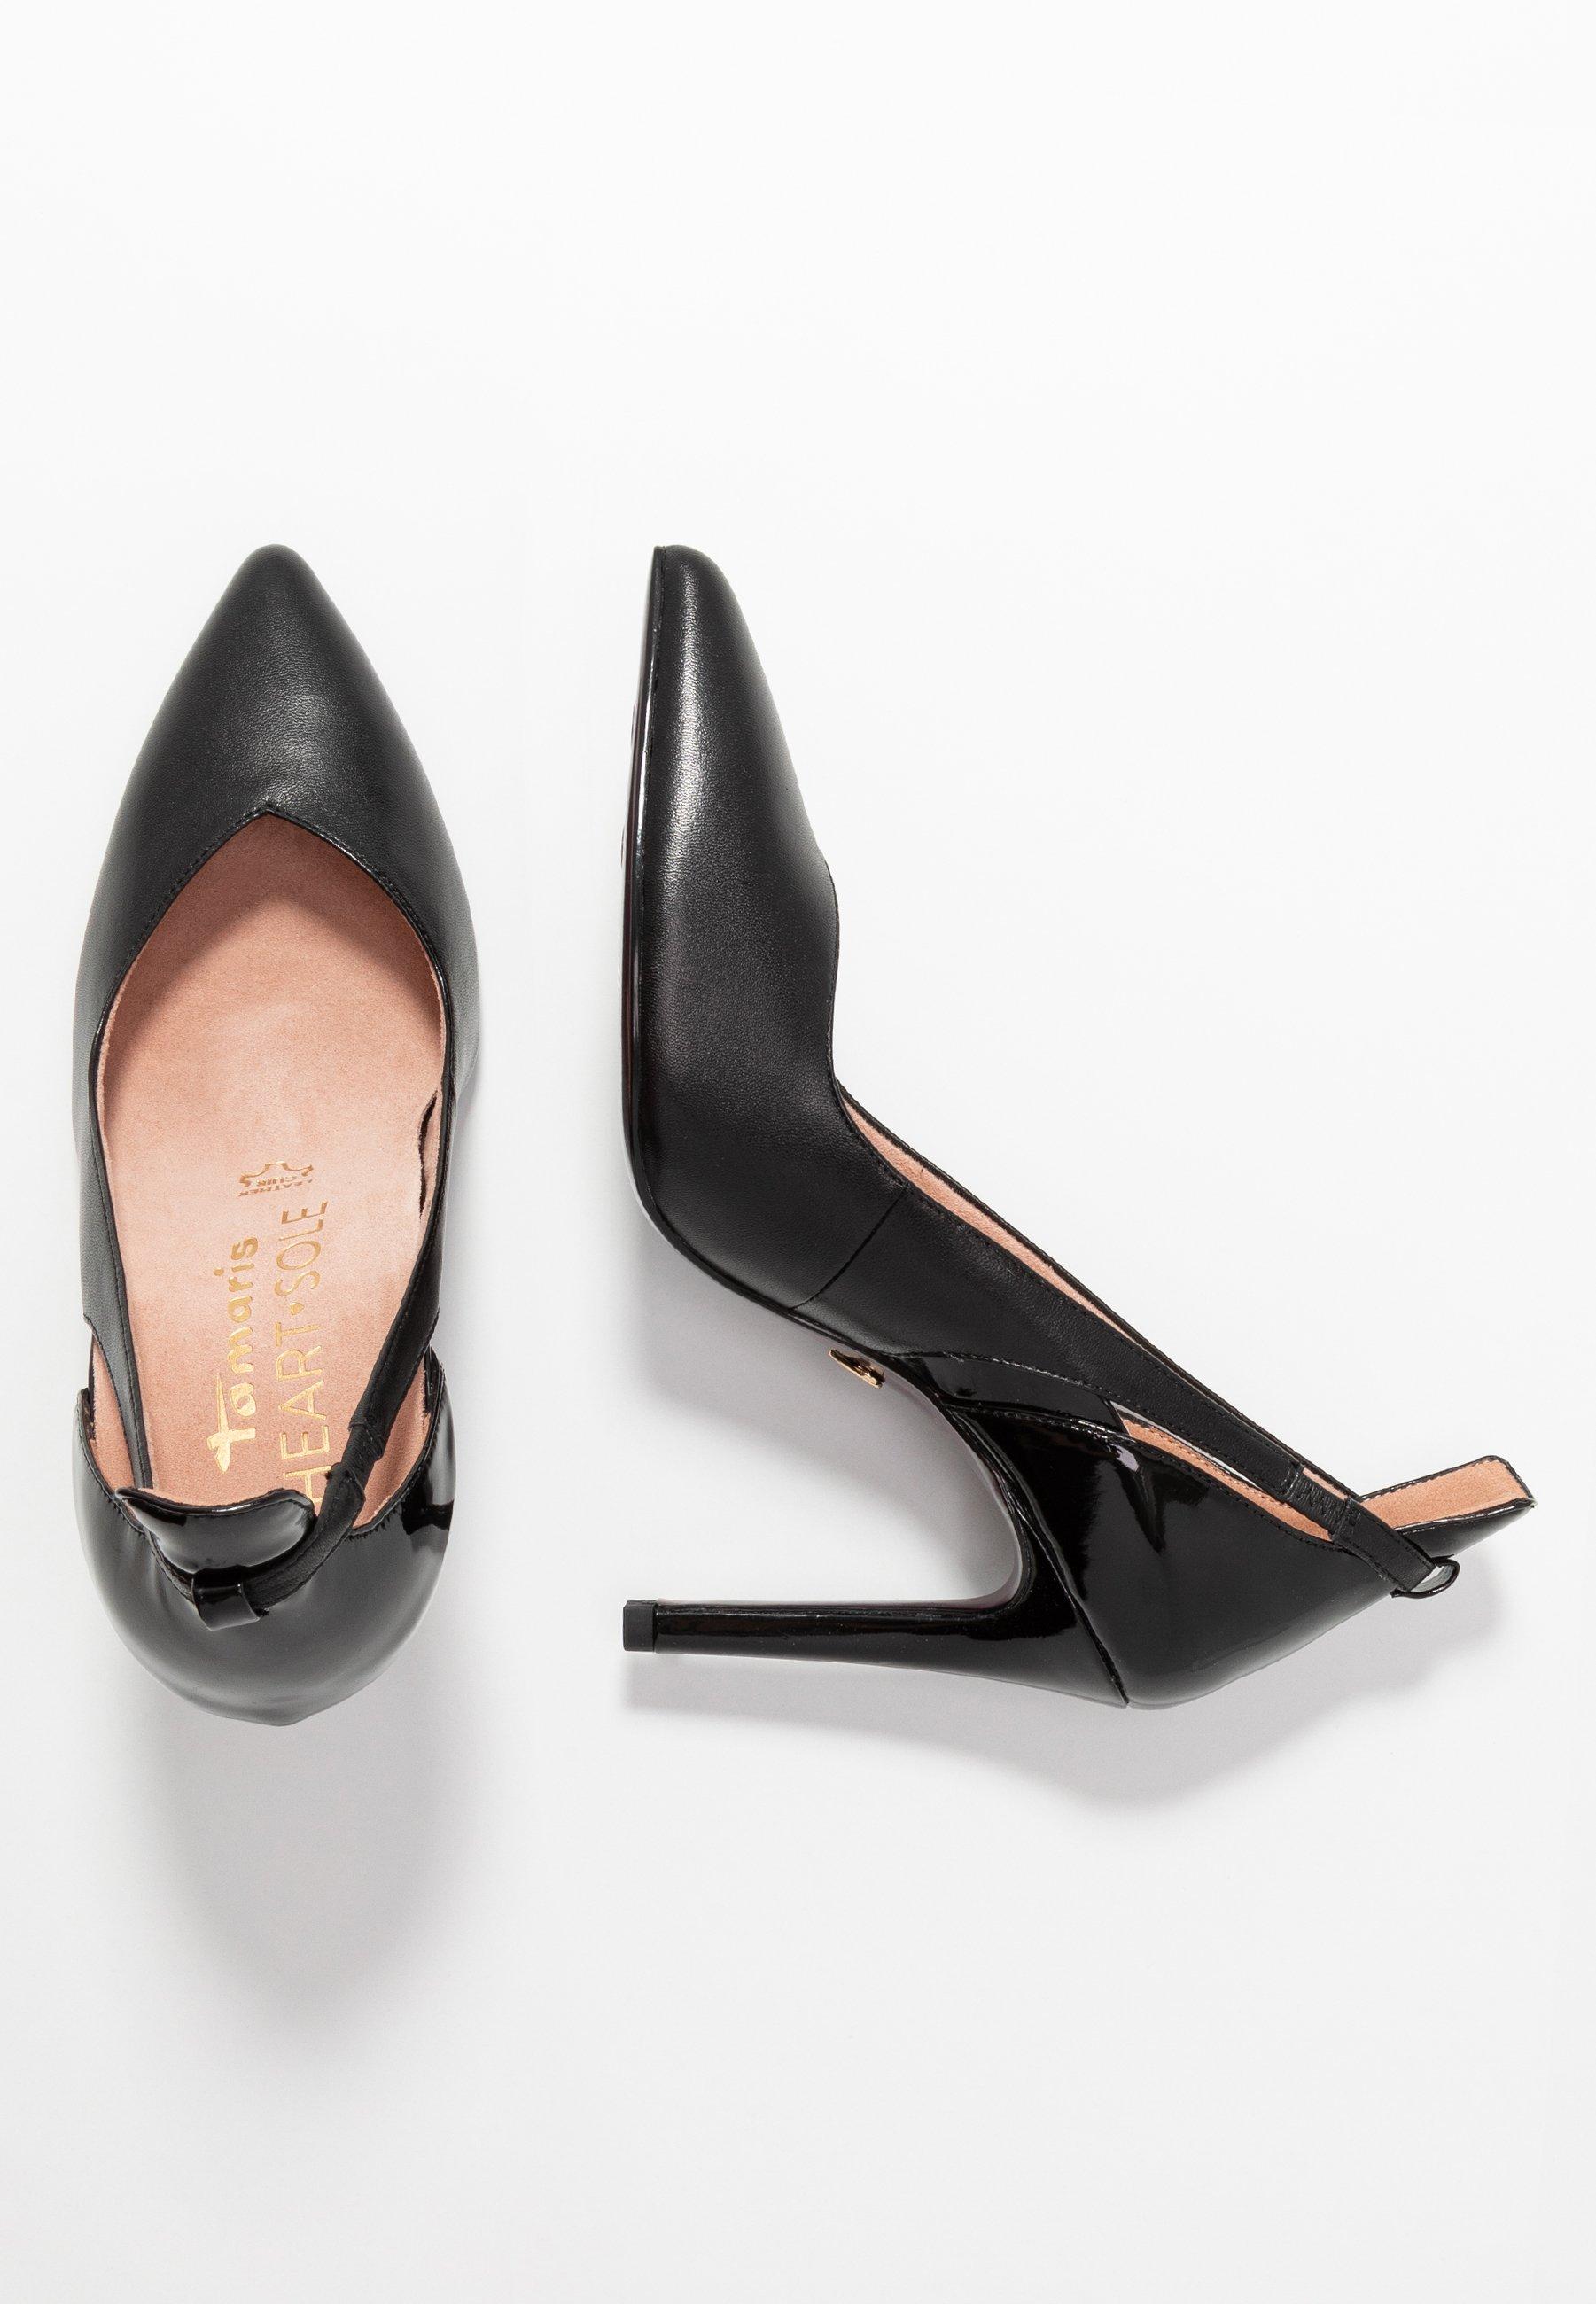 Tamaris Heart & Sole Court Shoe - Klassiska Pumps Black